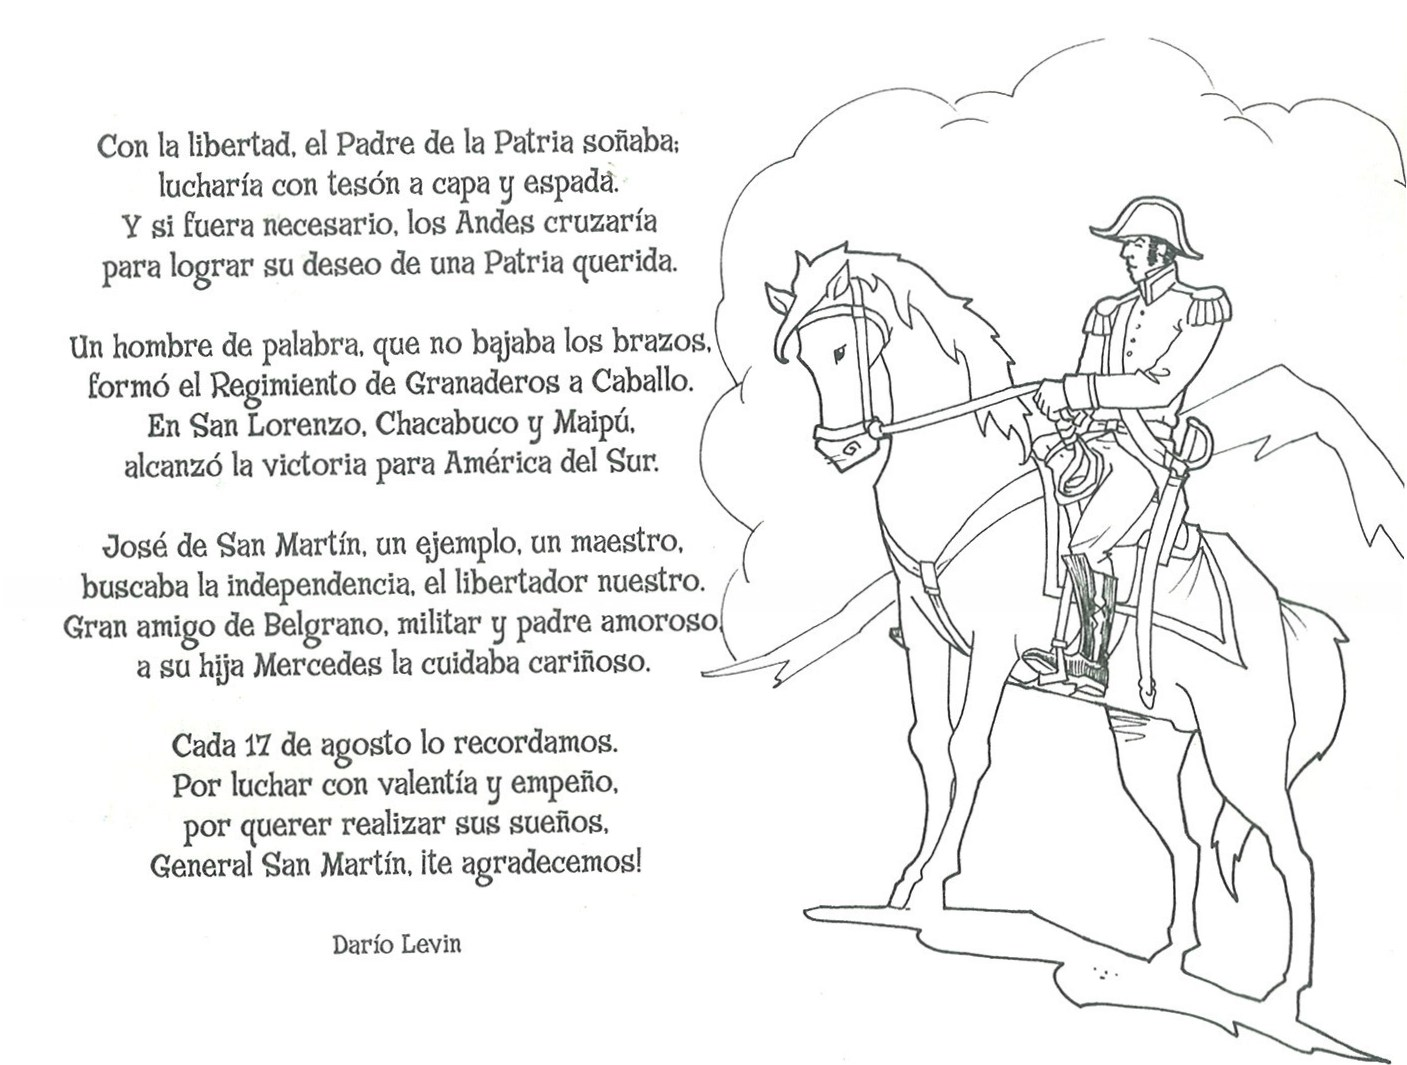 10 Ideas De Jose De San Martin Jose De San Martin San Martin Jose Francisco De San Martín